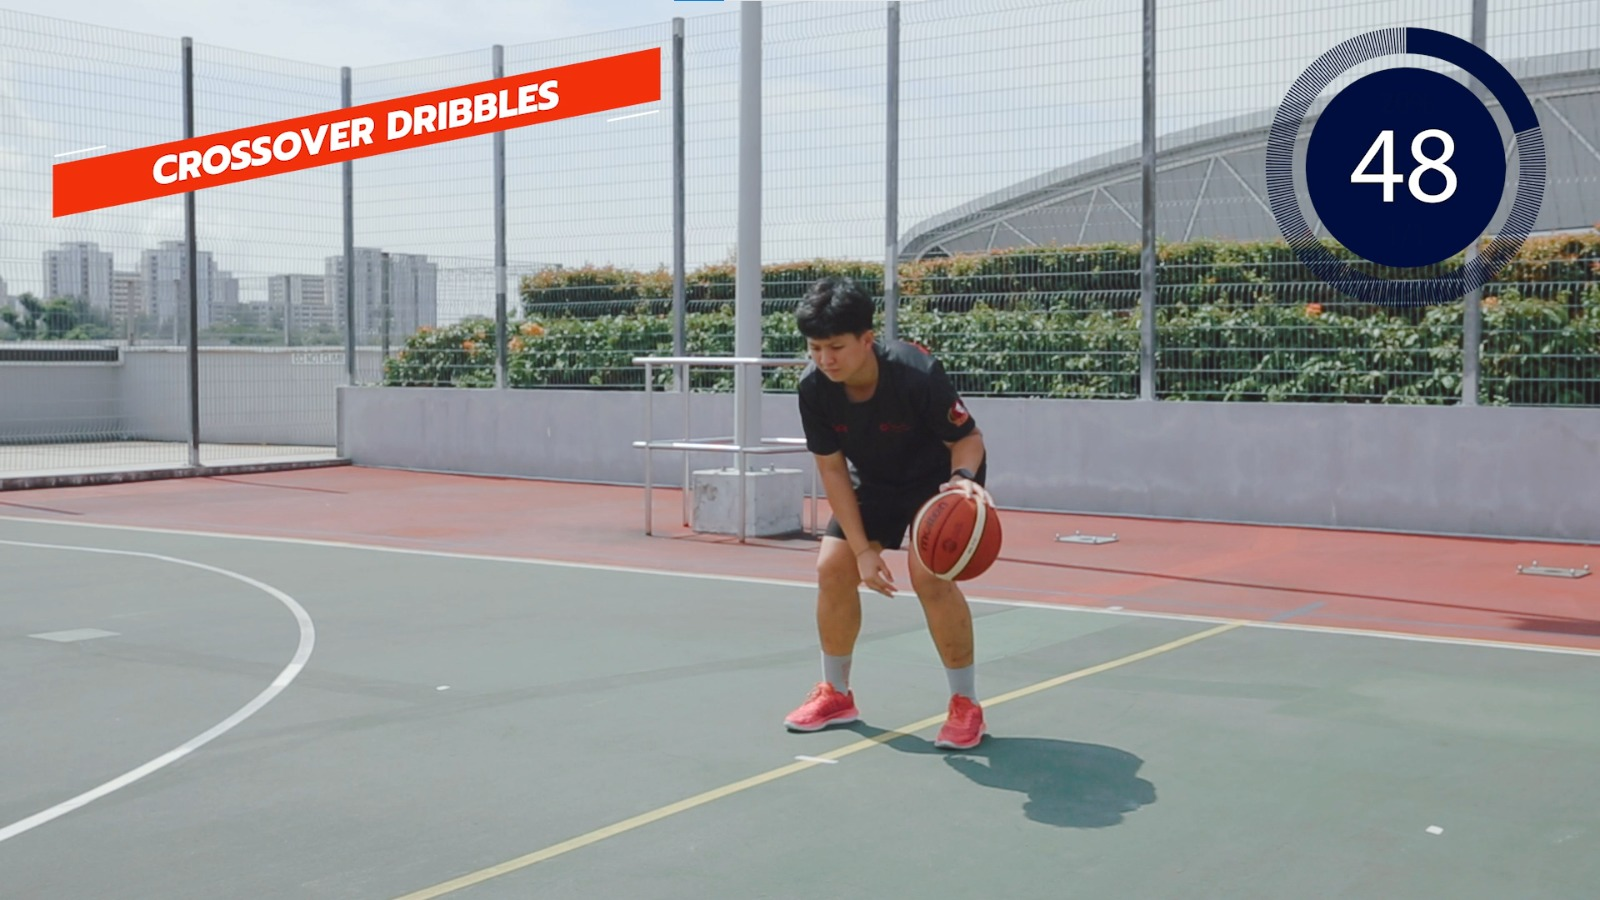 basketball crossover dribbles